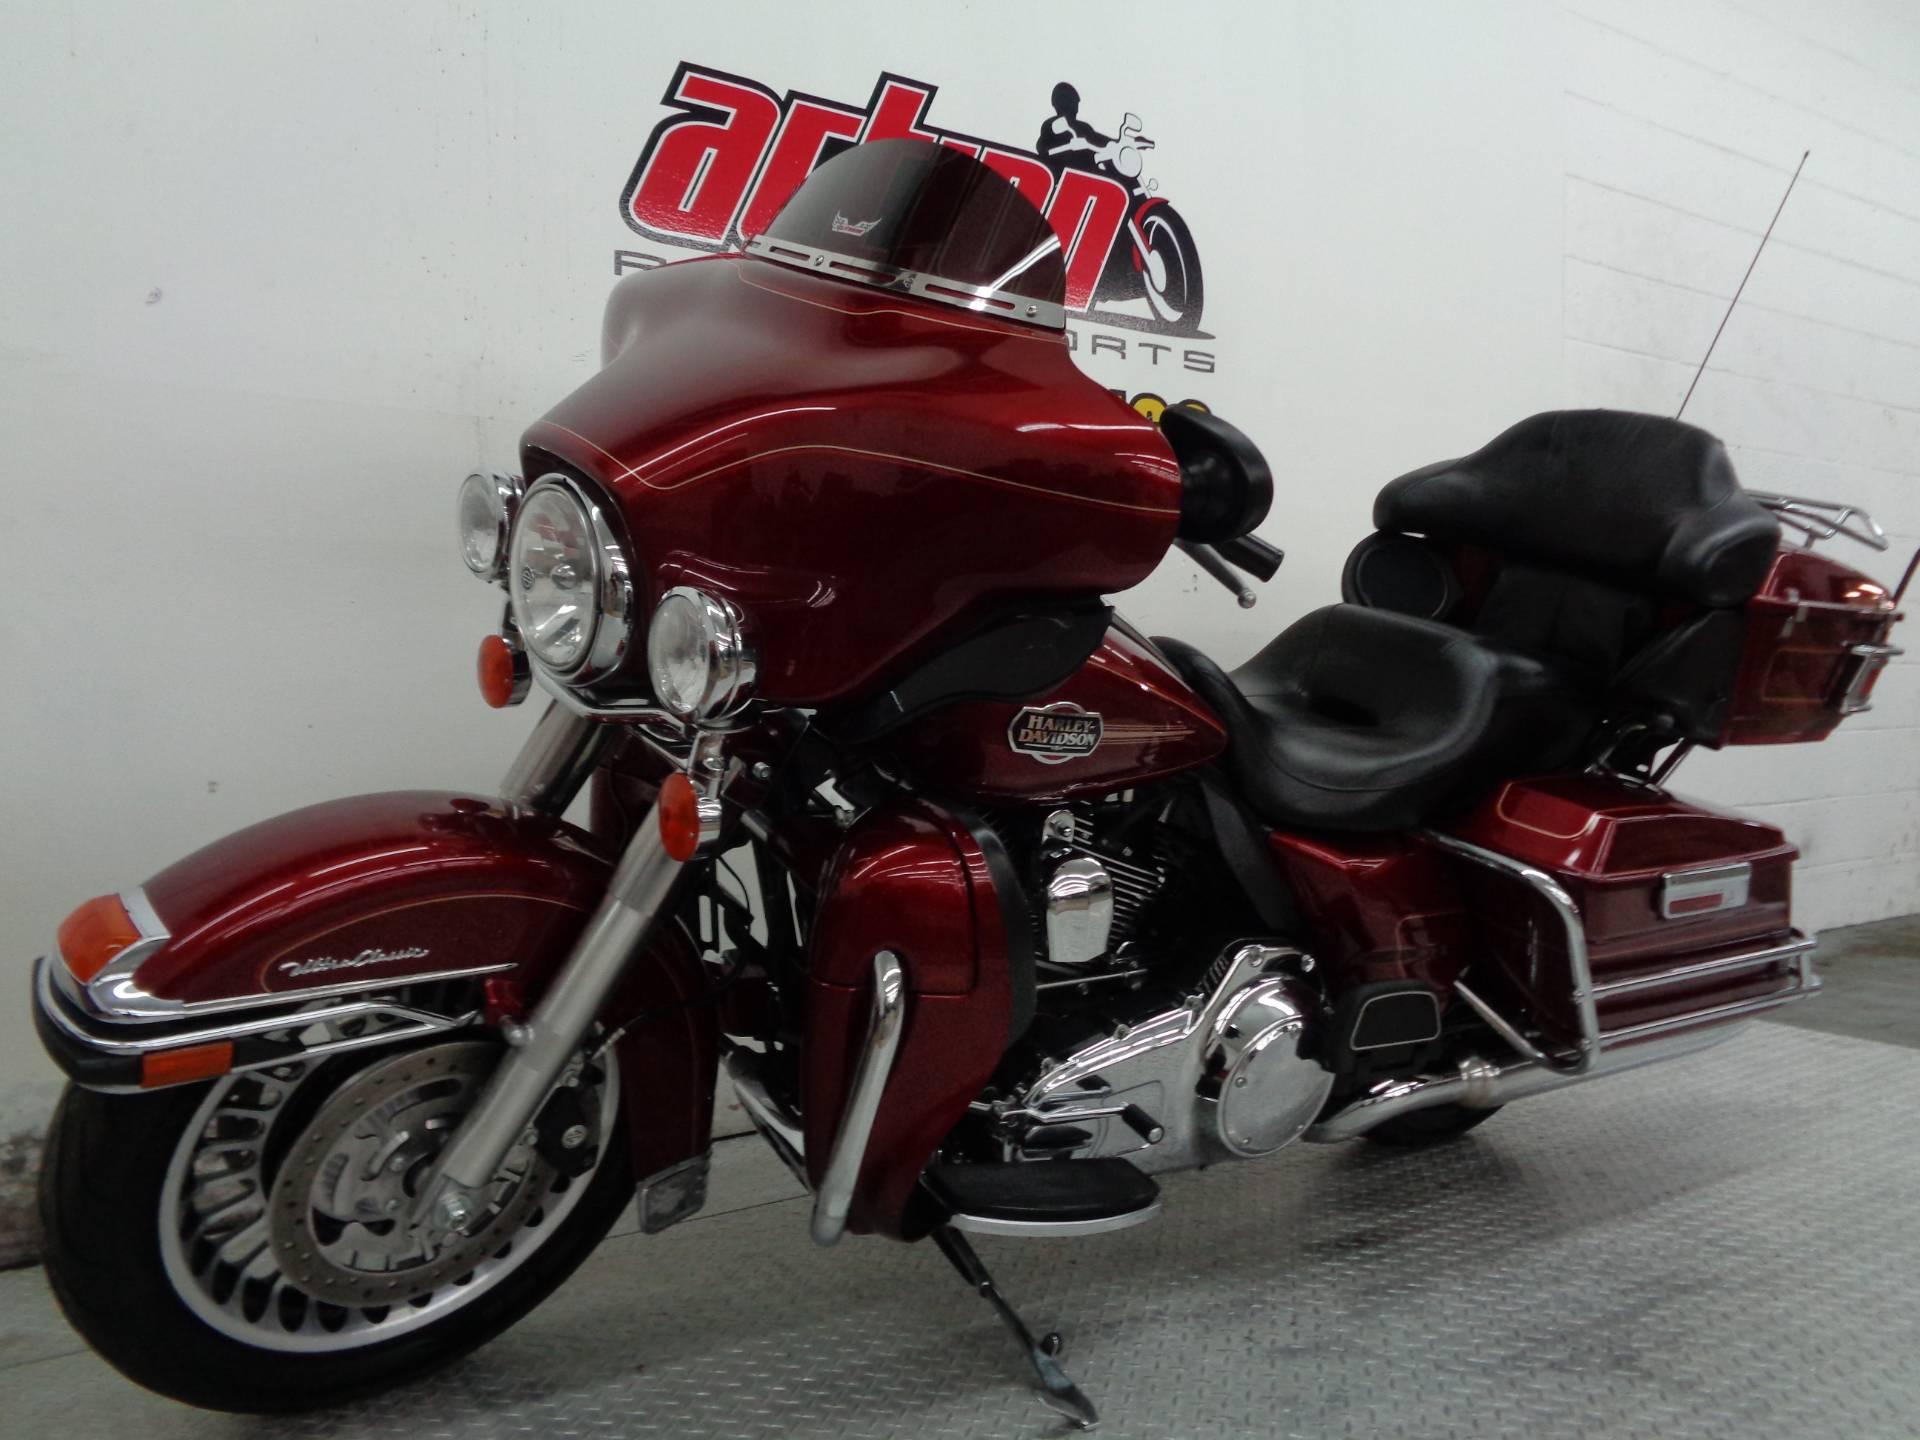 Harley Davidson Electra Glide For Sale Tulsa Ok >> Used 2009 Harley-Davidson Ultra Classic® Electra Glide® Motorcycles in Tulsa, OK | Stock Number ...